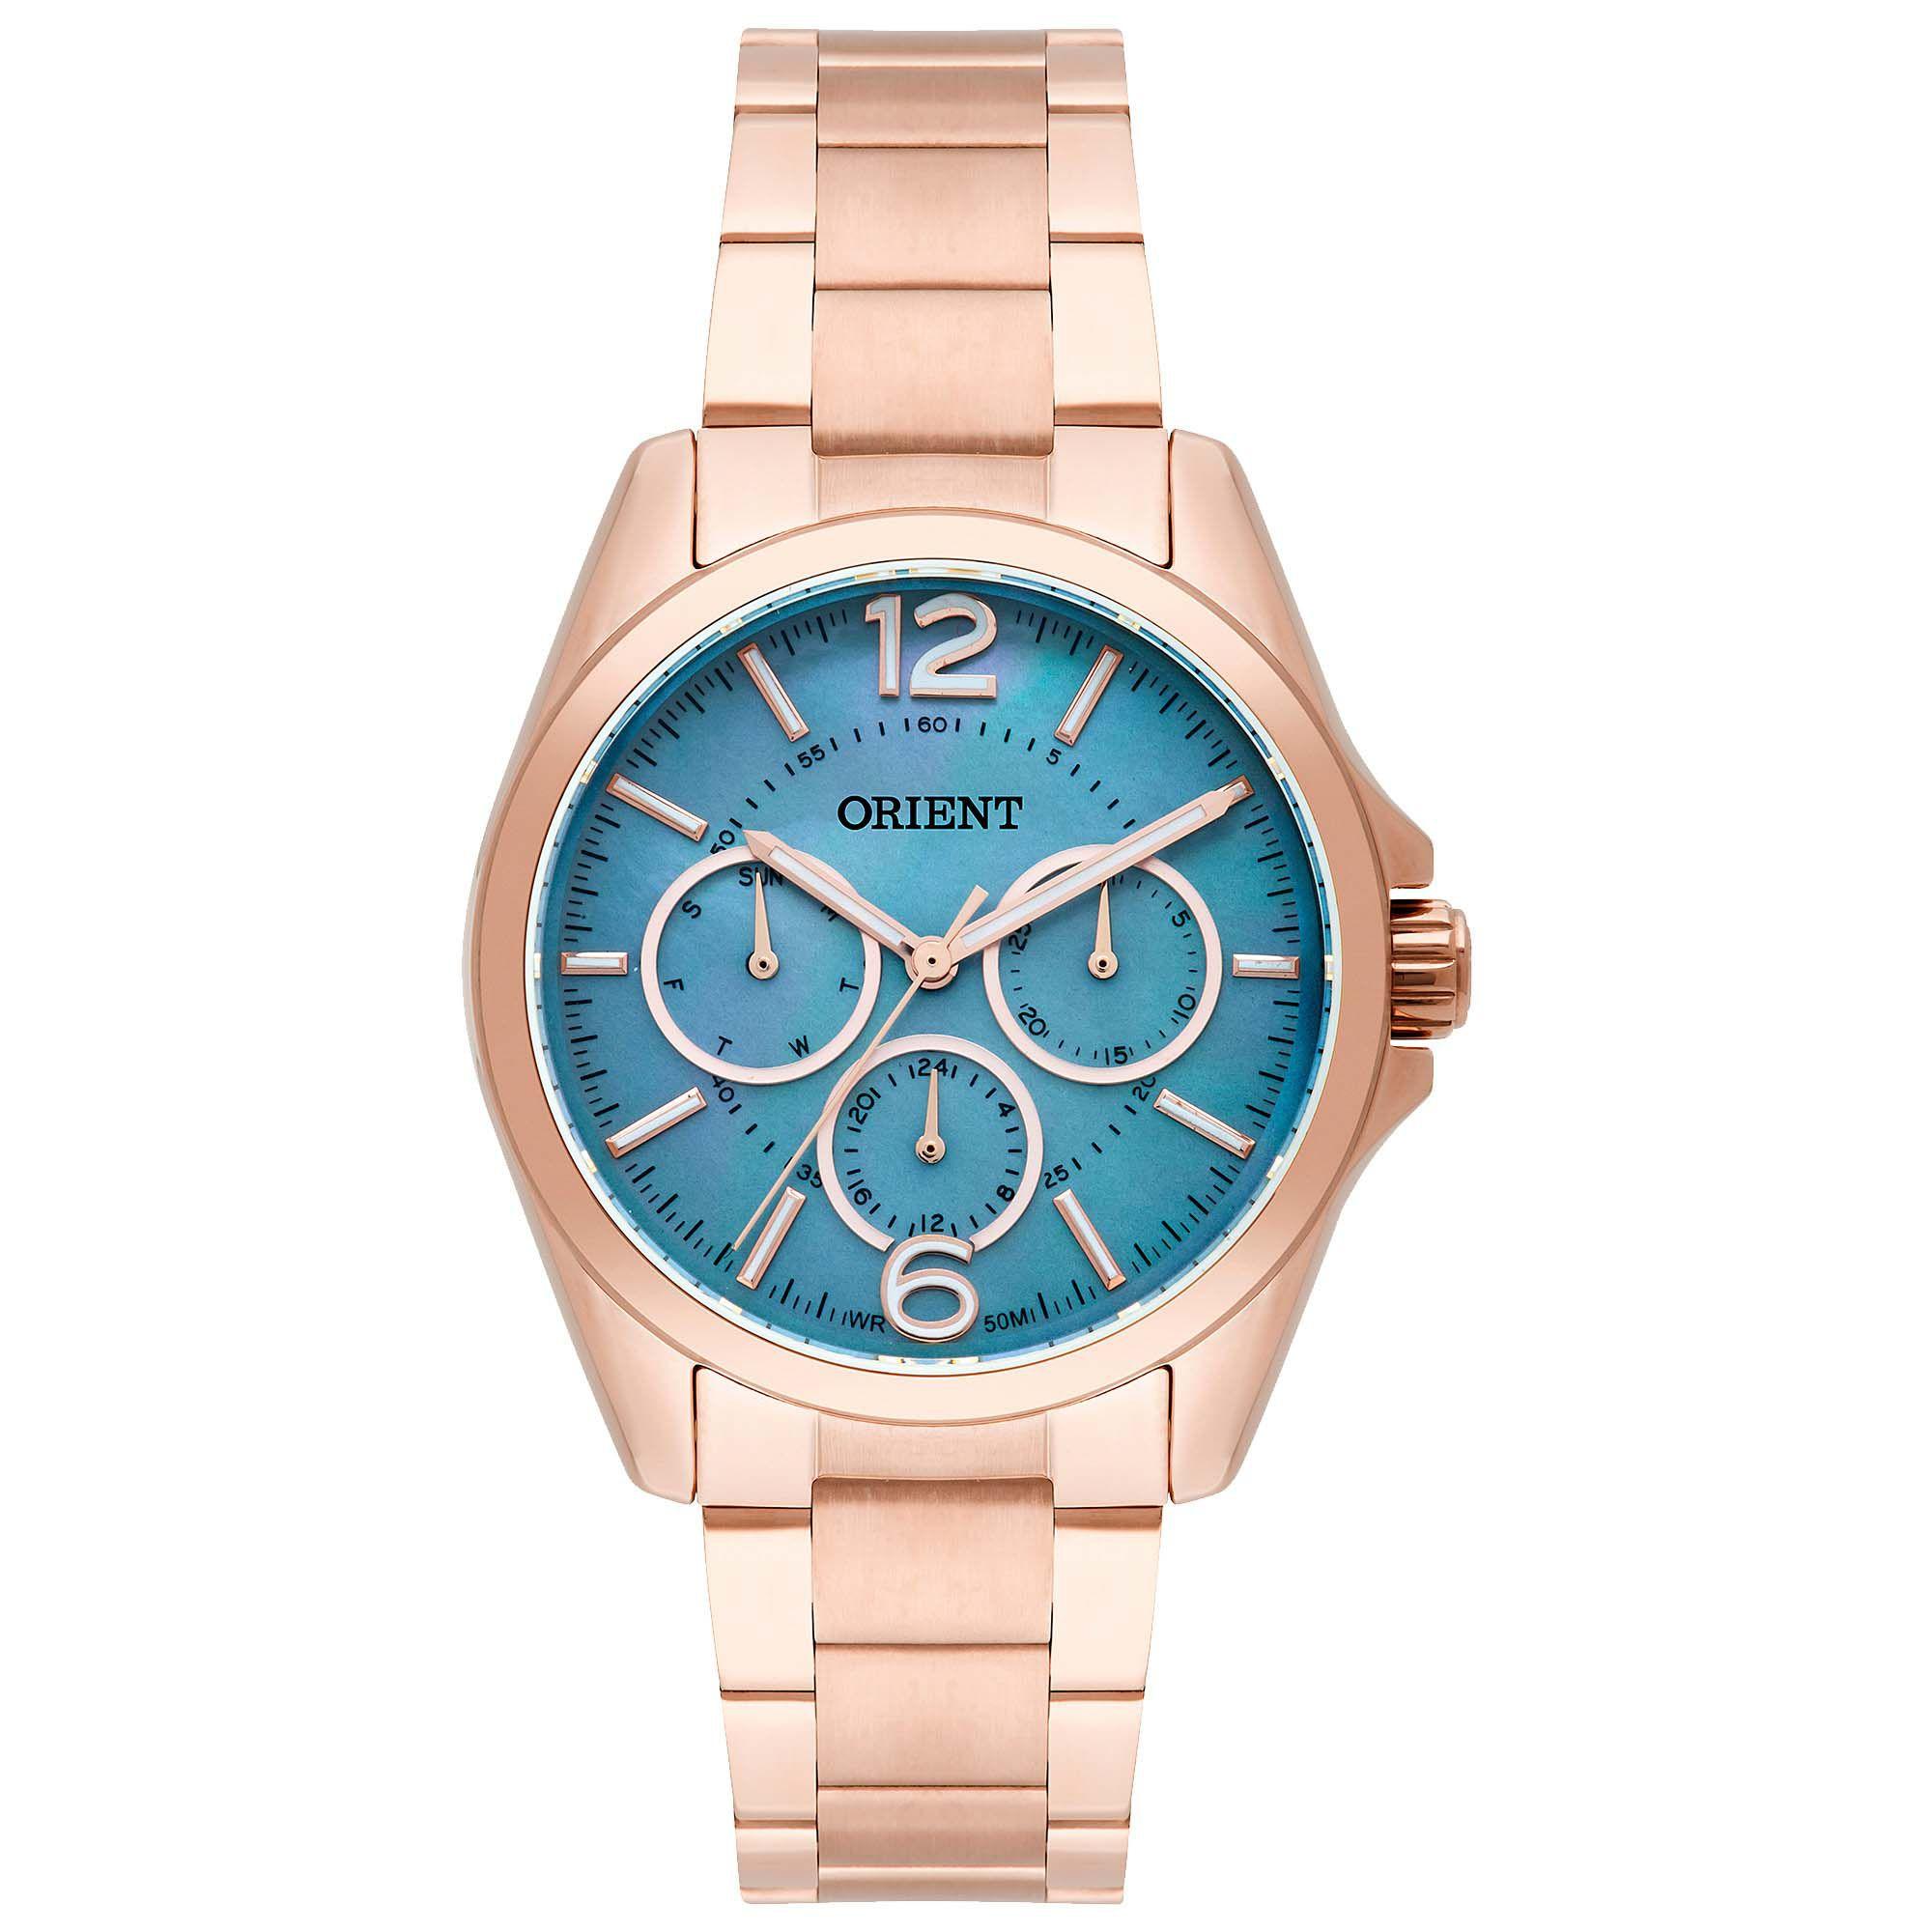 Relógio Feminino Orient FRSSM022 G2RX